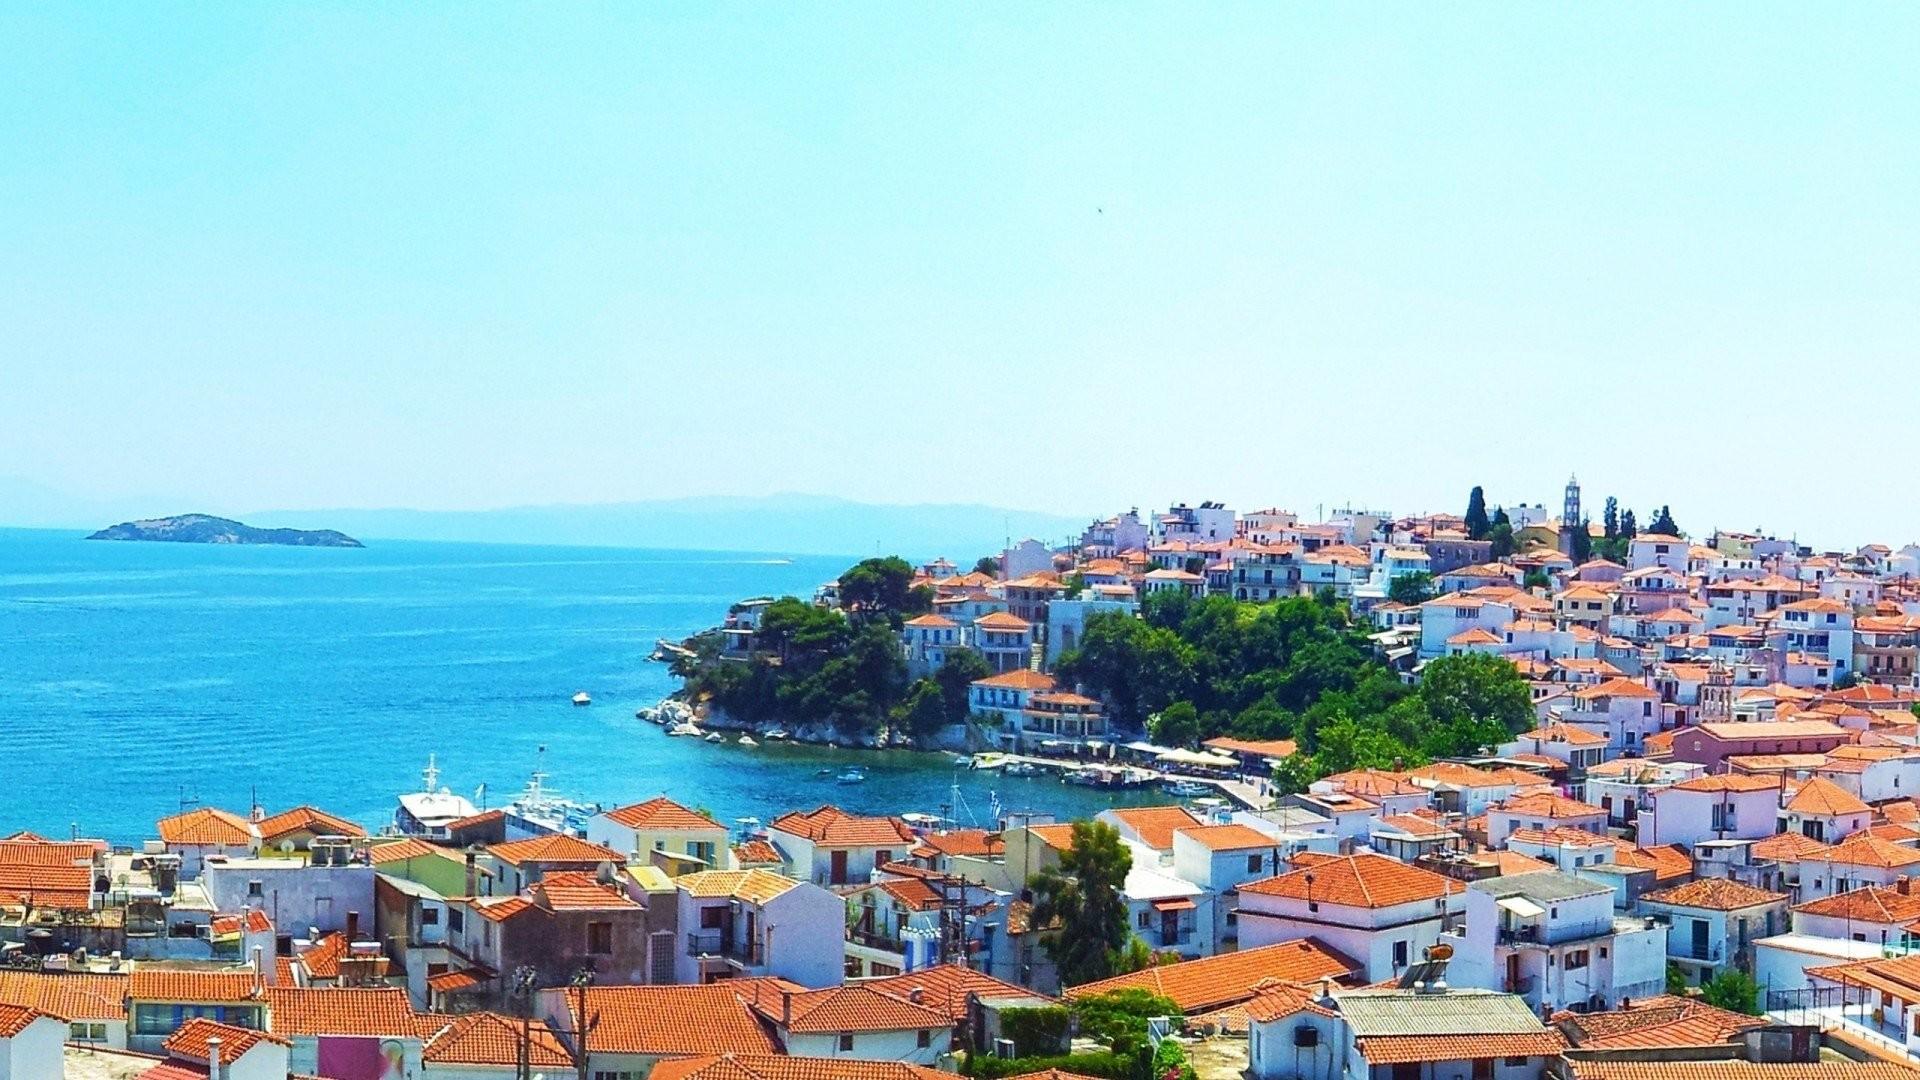 Res: 1920x1080, mediterranean town coast